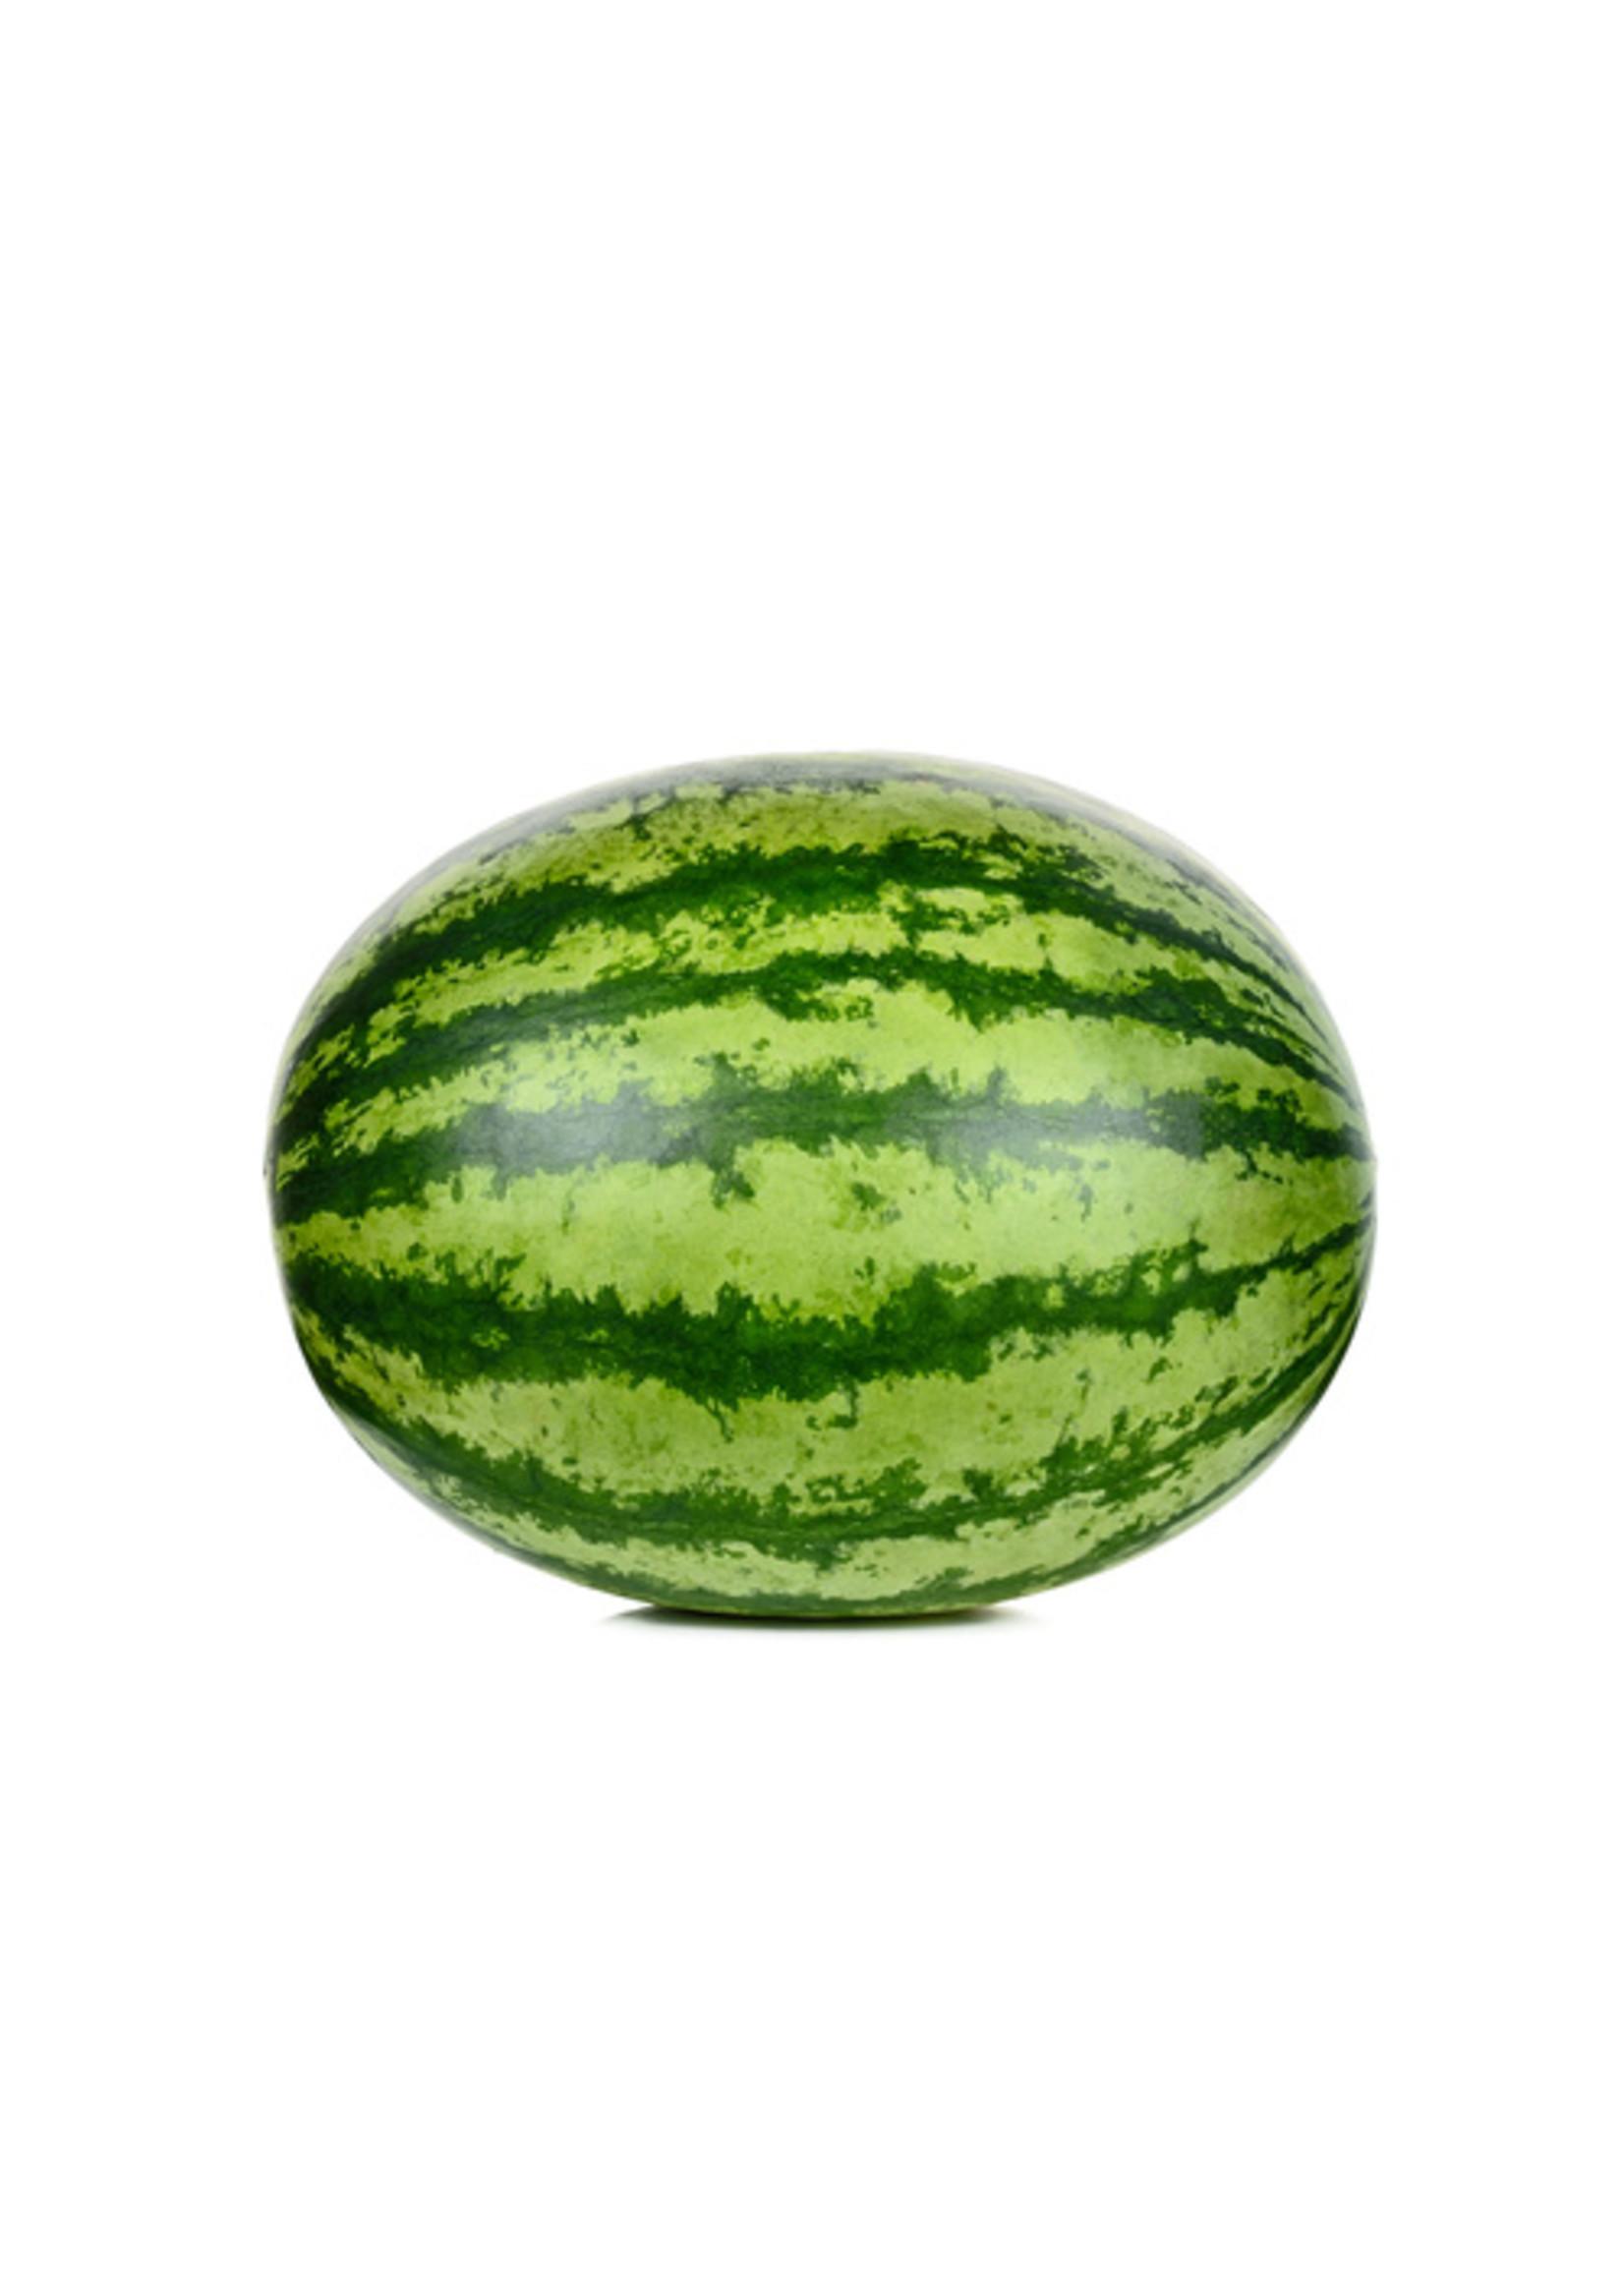 Watermeloen seedless stuk groot